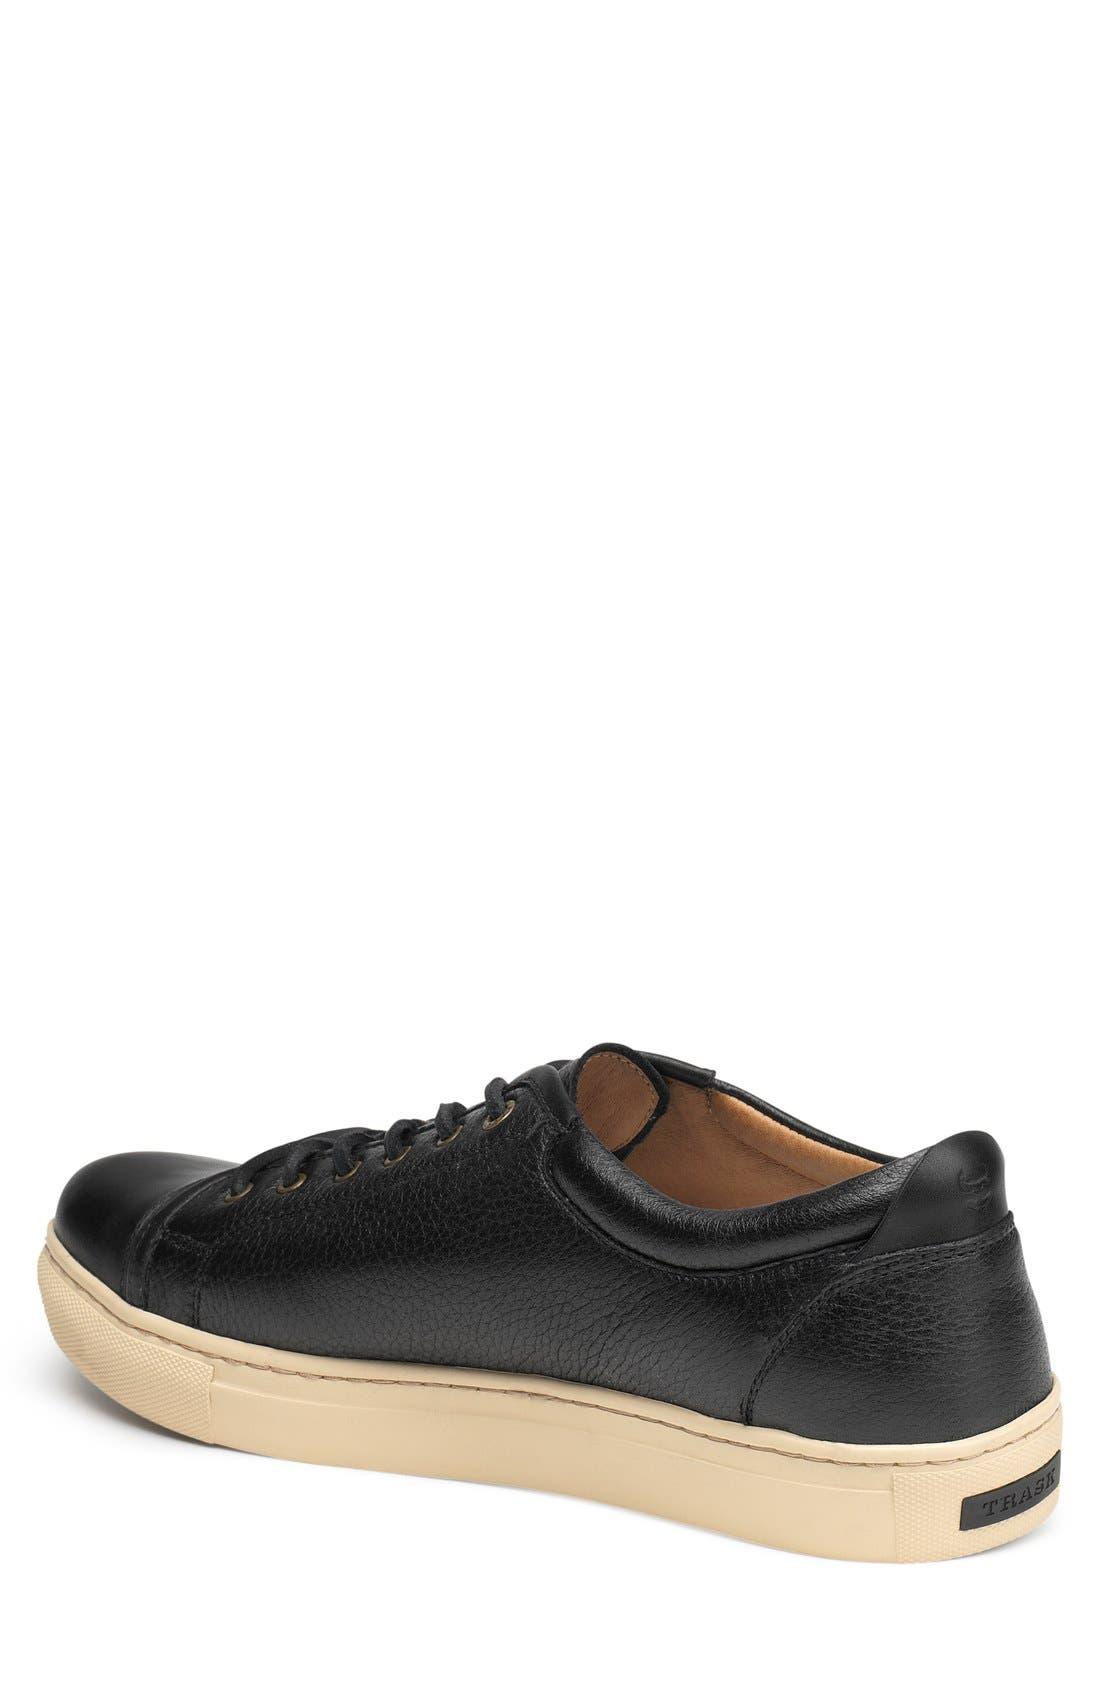 'Beck' Sneaker,                             Alternate thumbnail 2, color,                             BLACK NORWEGIAN ELK